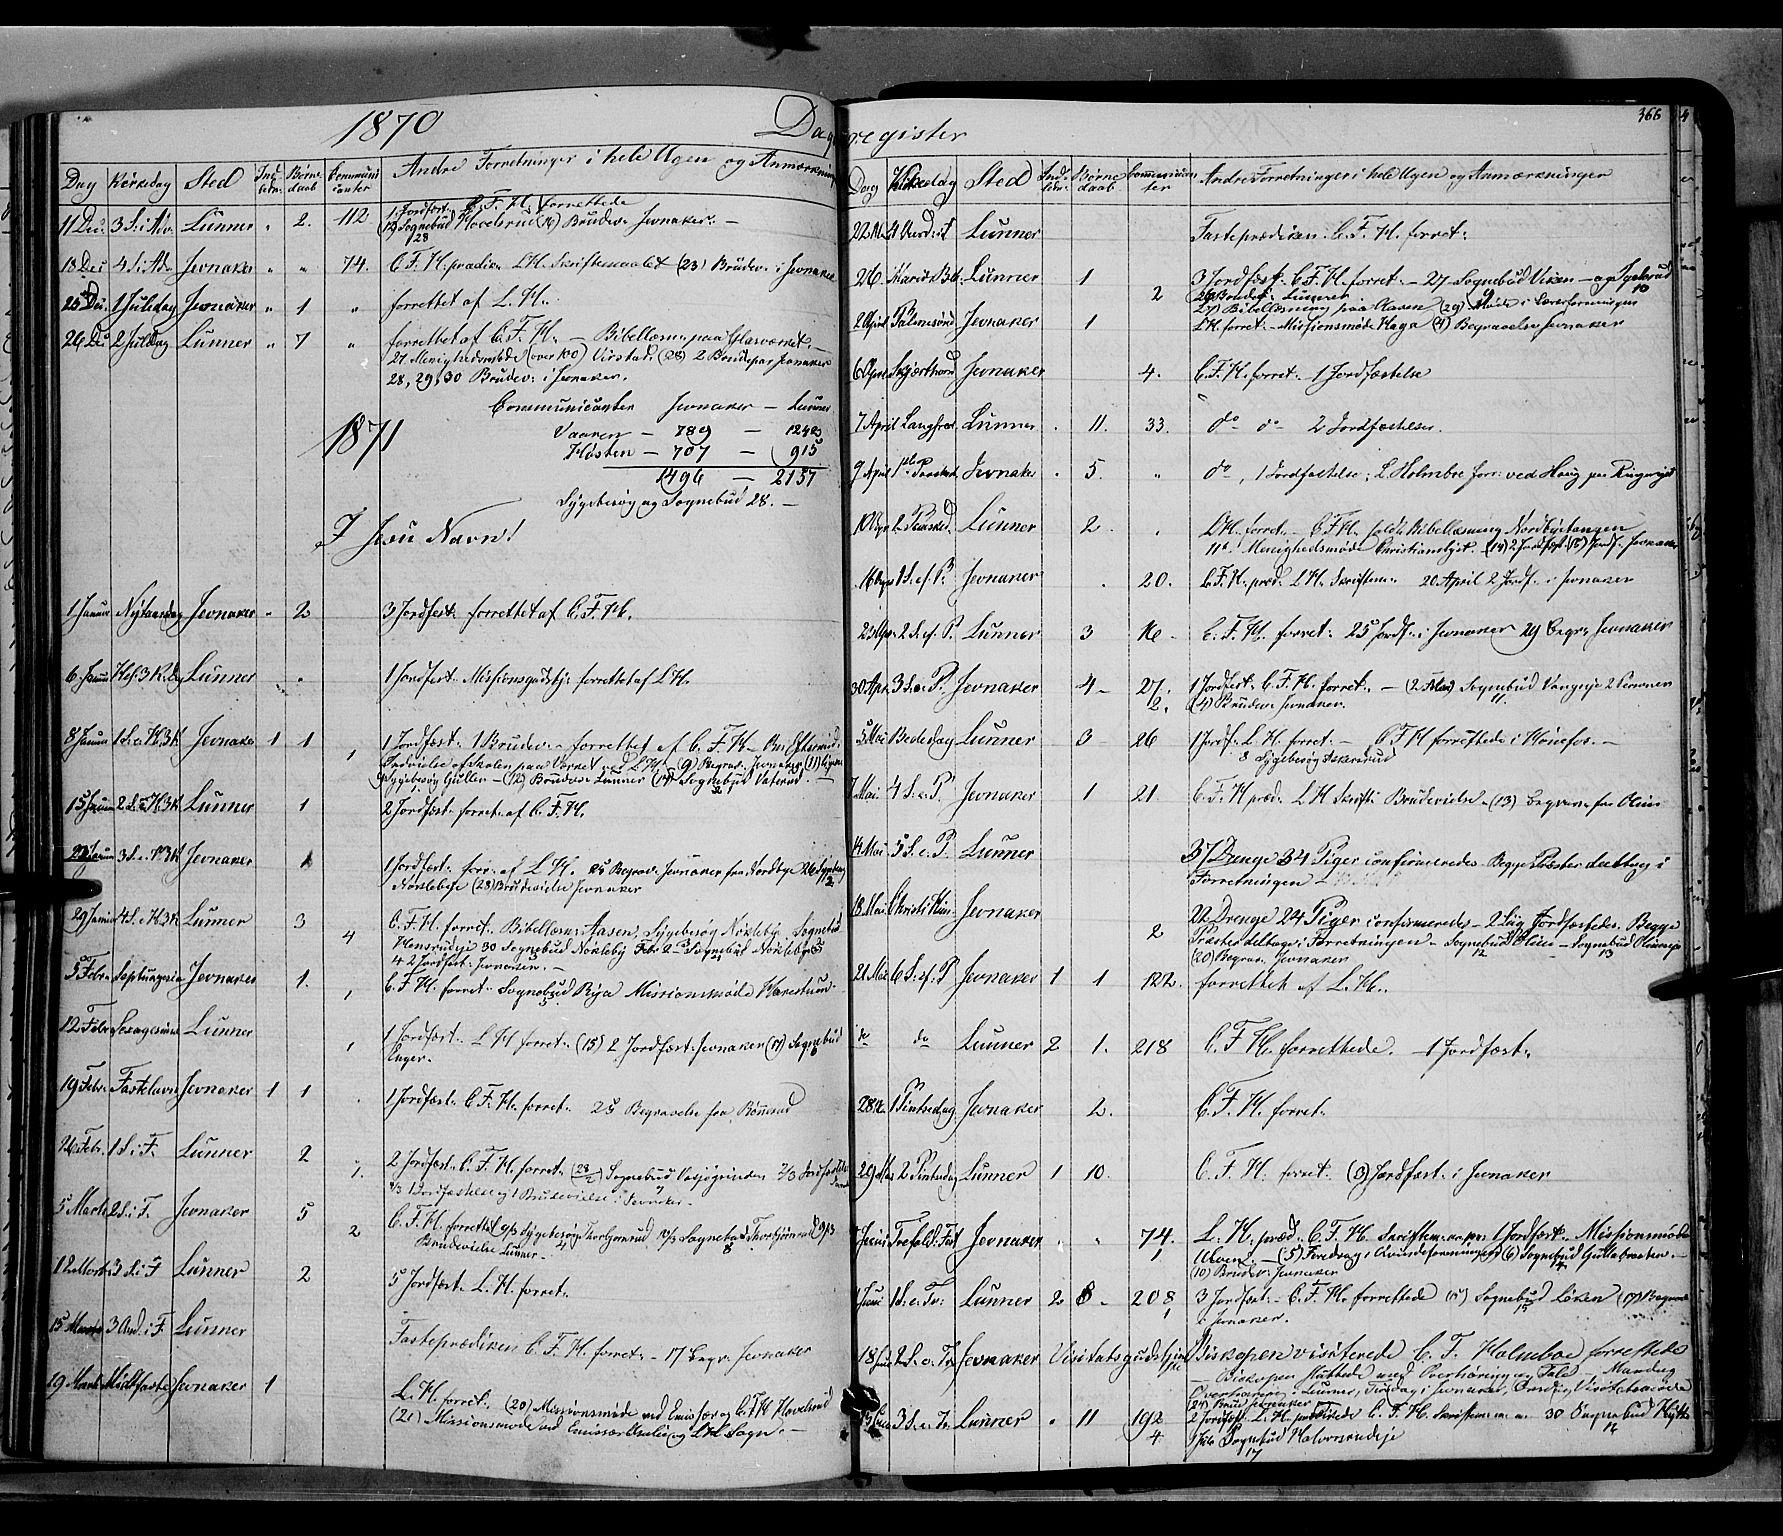 SAH, Jevnaker prestekontor, Ministerialbok nr. 7, 1858-1876, s. 366